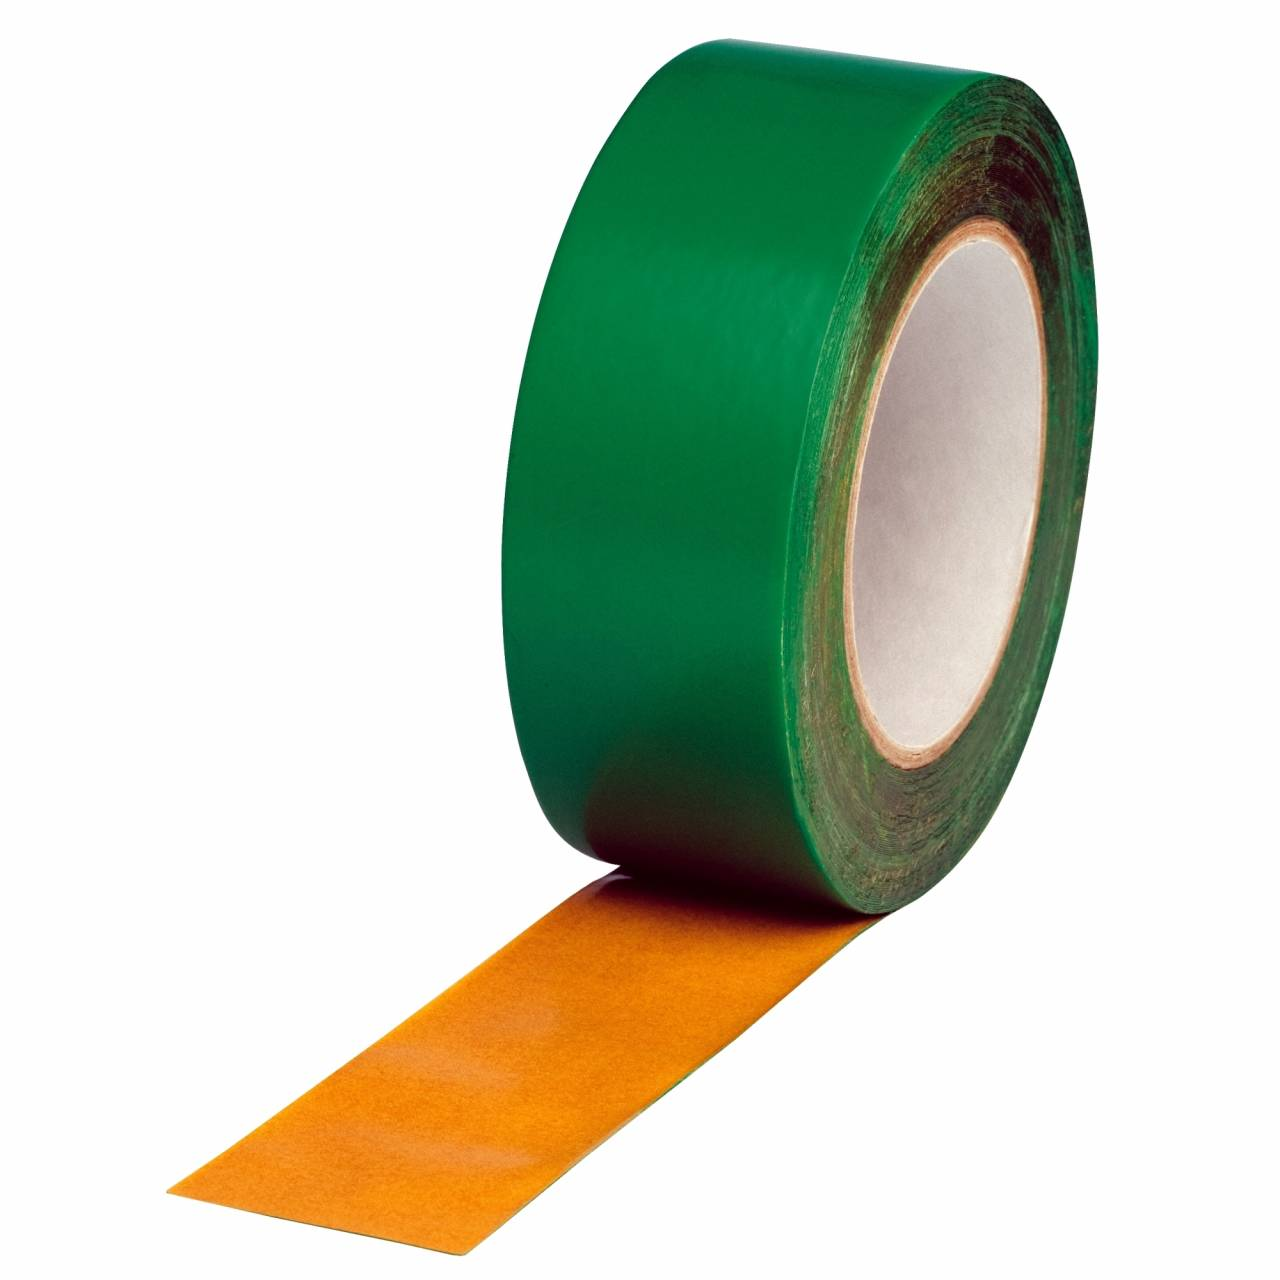 Dichtband 'ELASTO-FLEX' grün, 60 mm x 25 m / Rolle